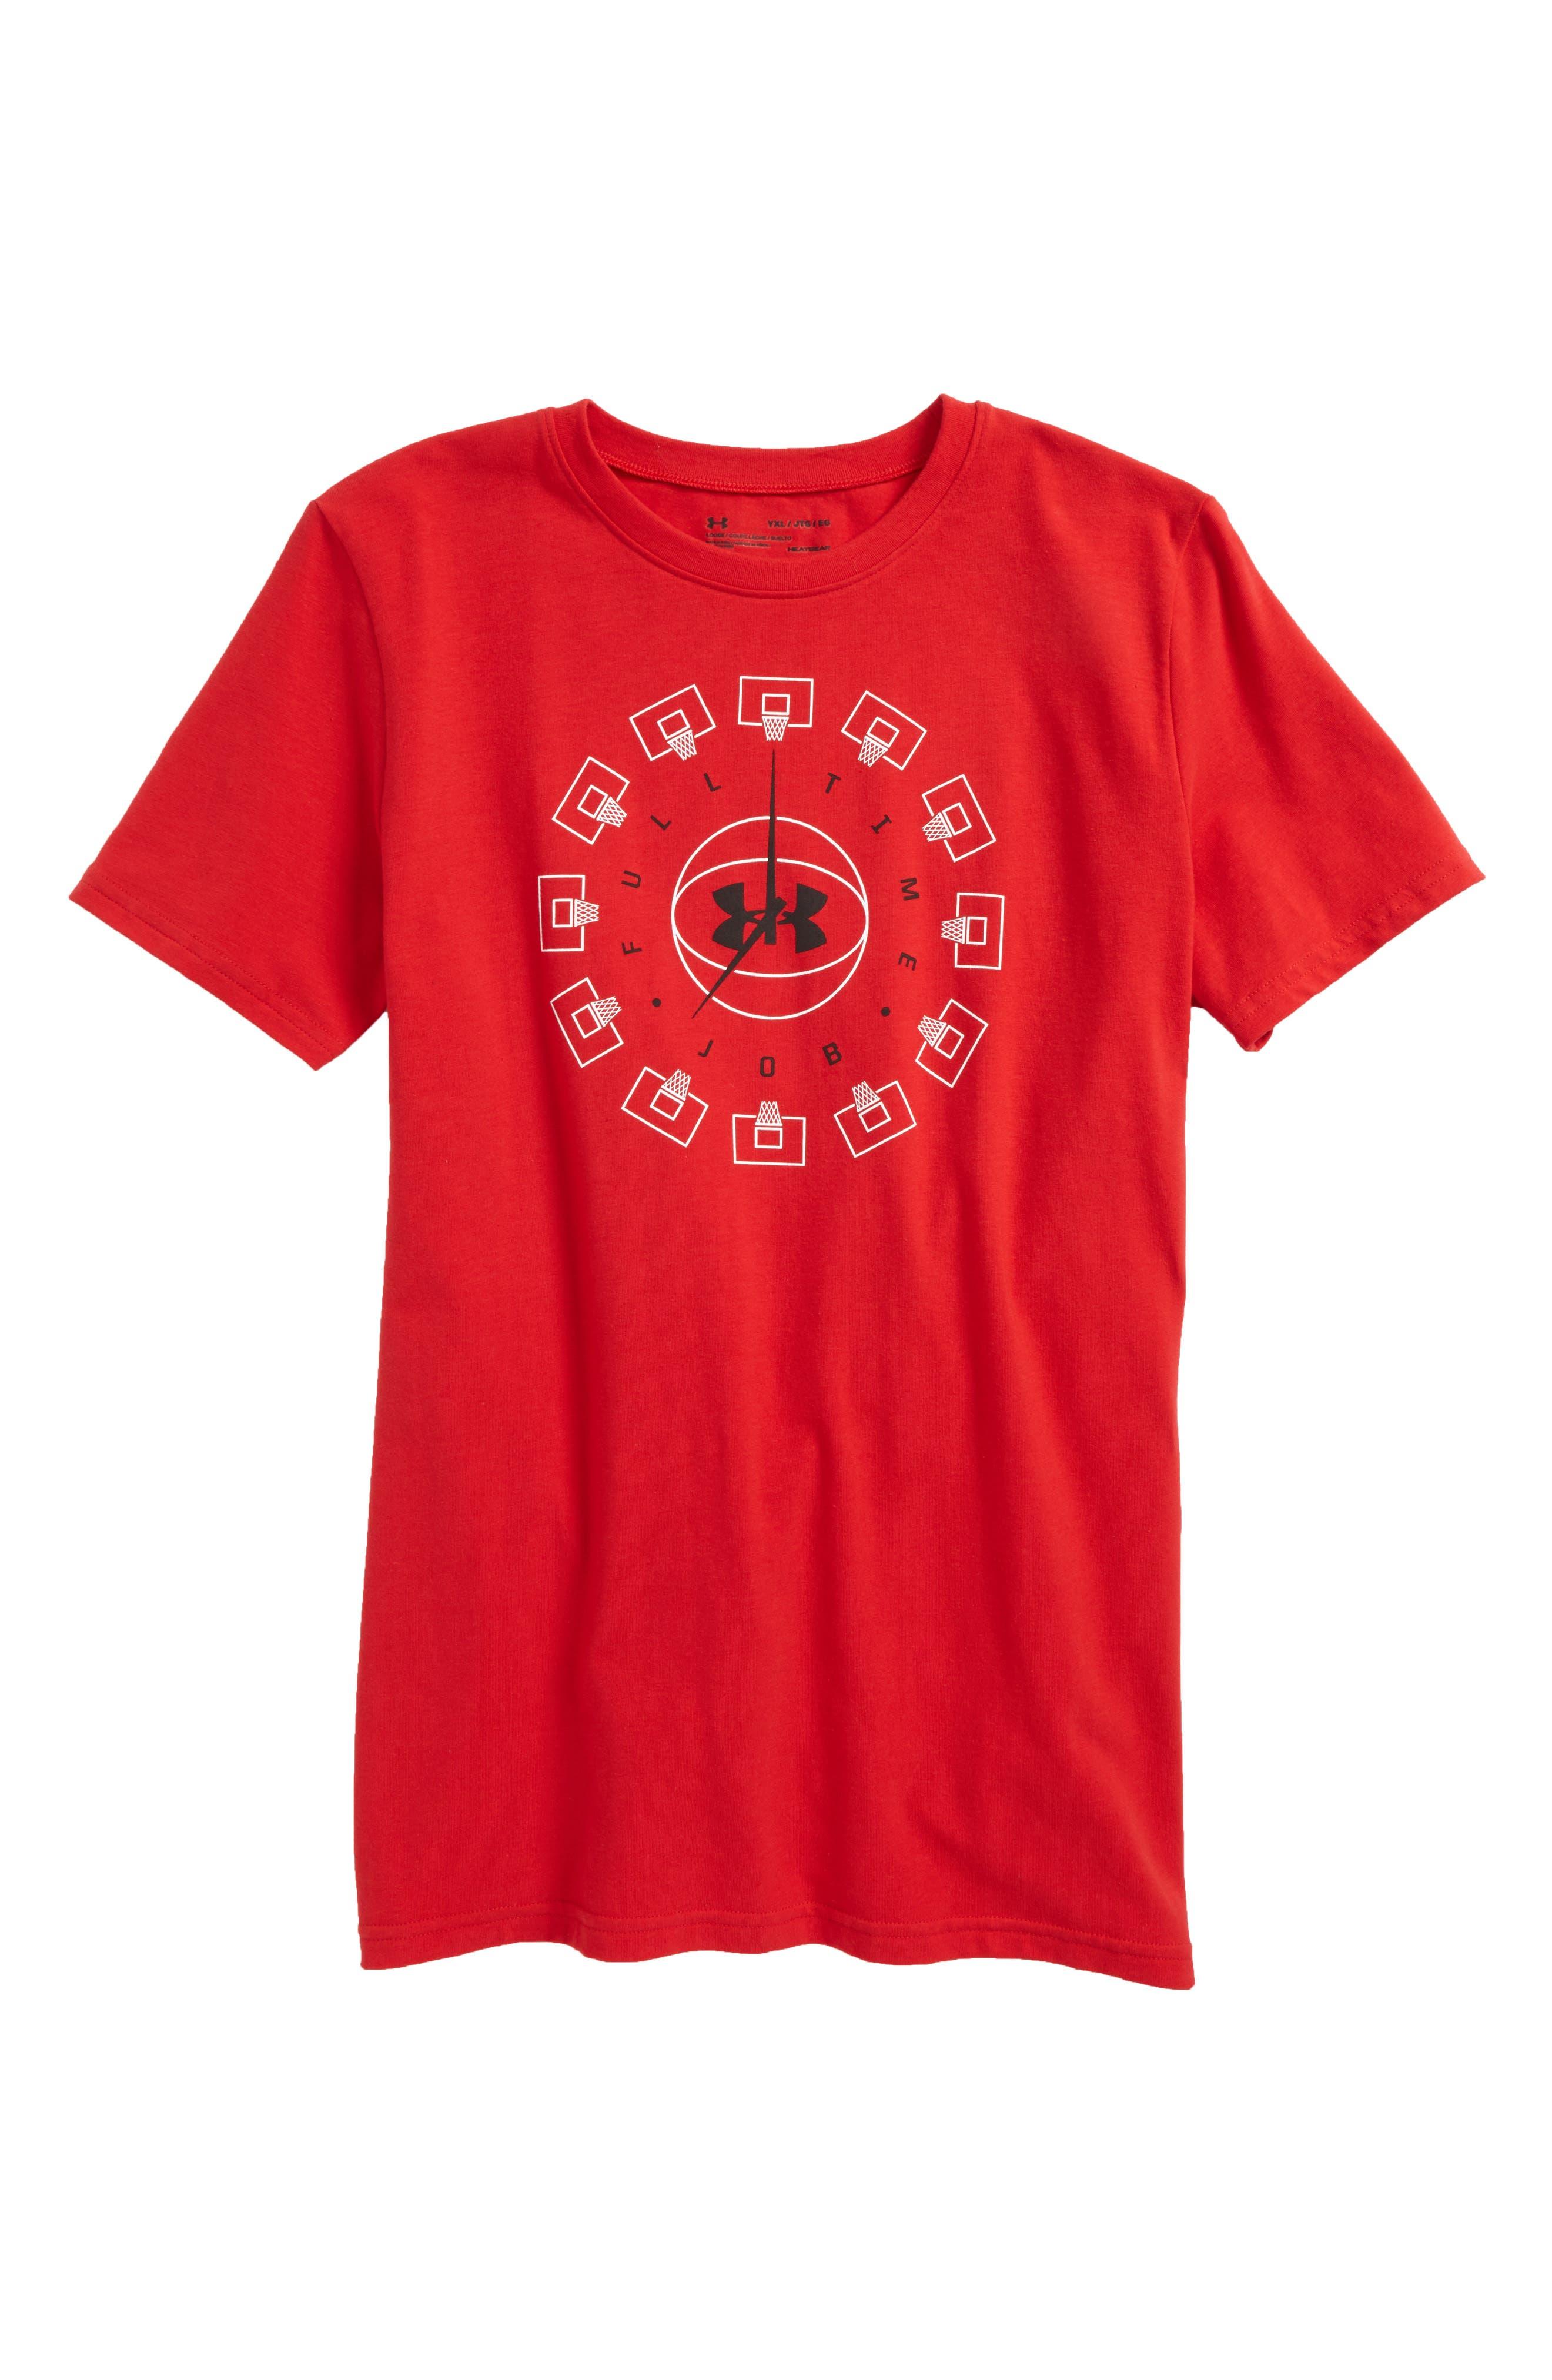 Under Armour Round the Clock HeatGear® T-Shirt (Little Boys & Big Boys)